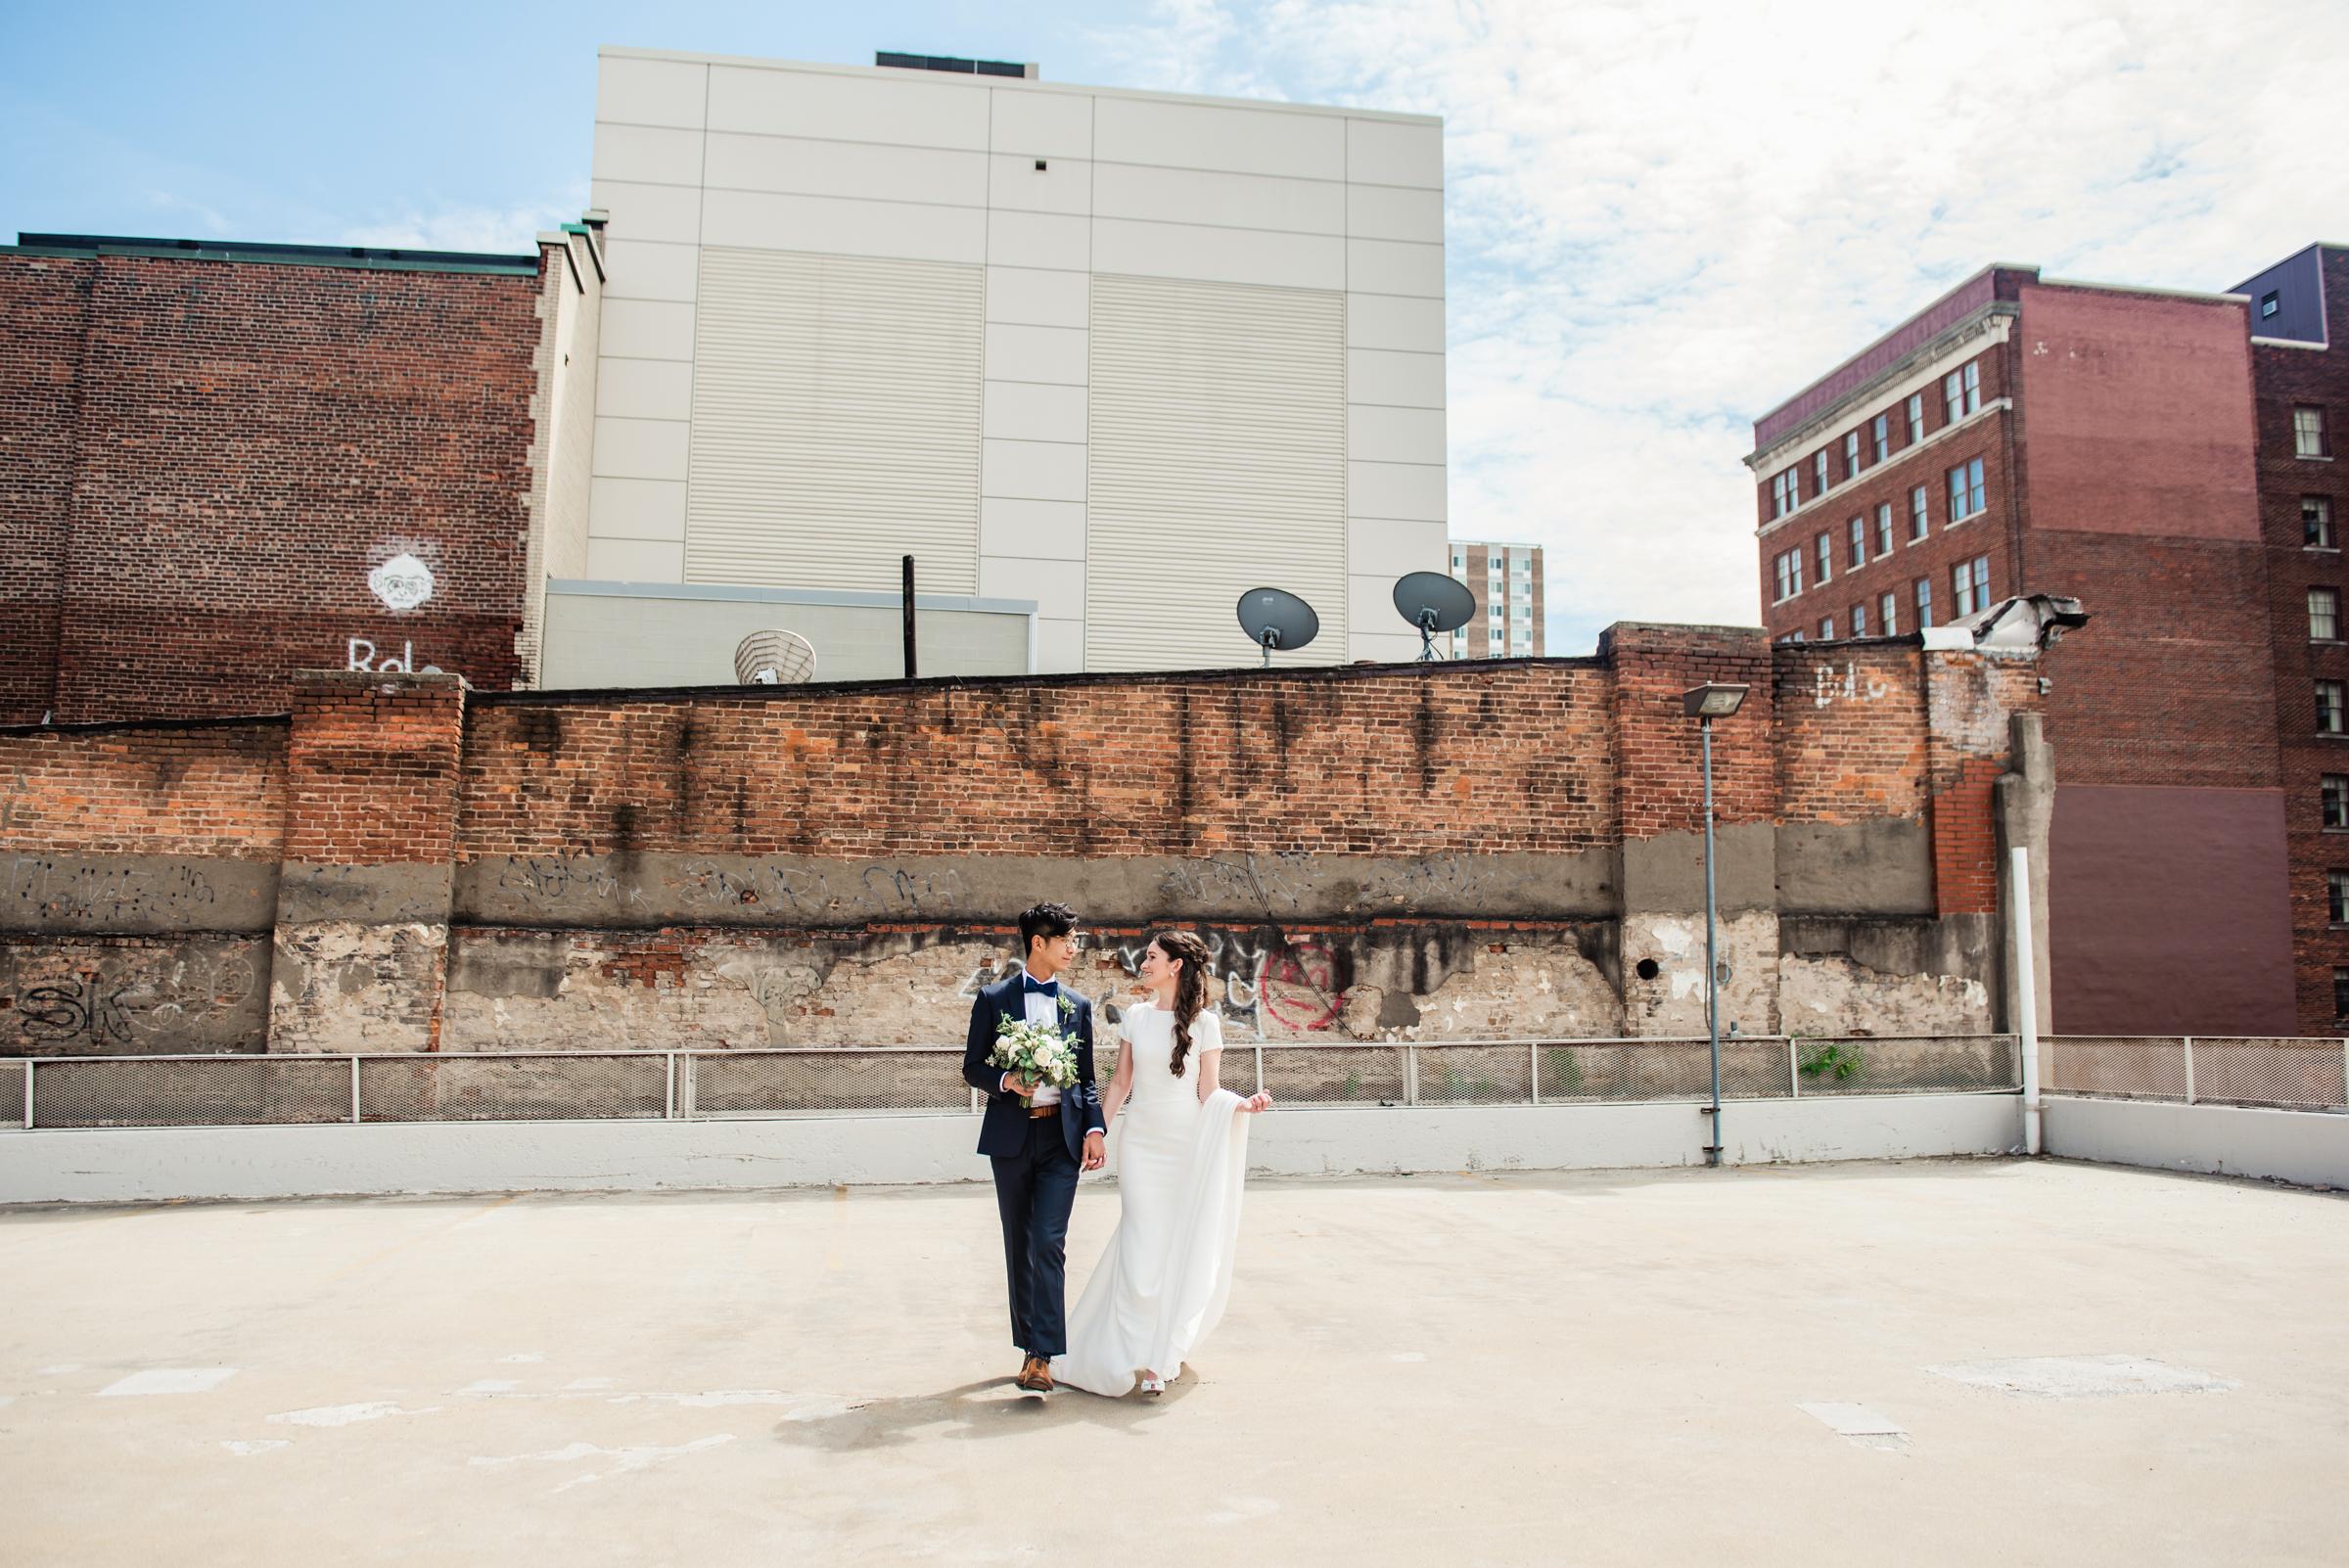 SKY_Armory_Syracuse_Wedding_JILL_STUDIO_Rochester_NY_Photographer_DSC_5254.jpg